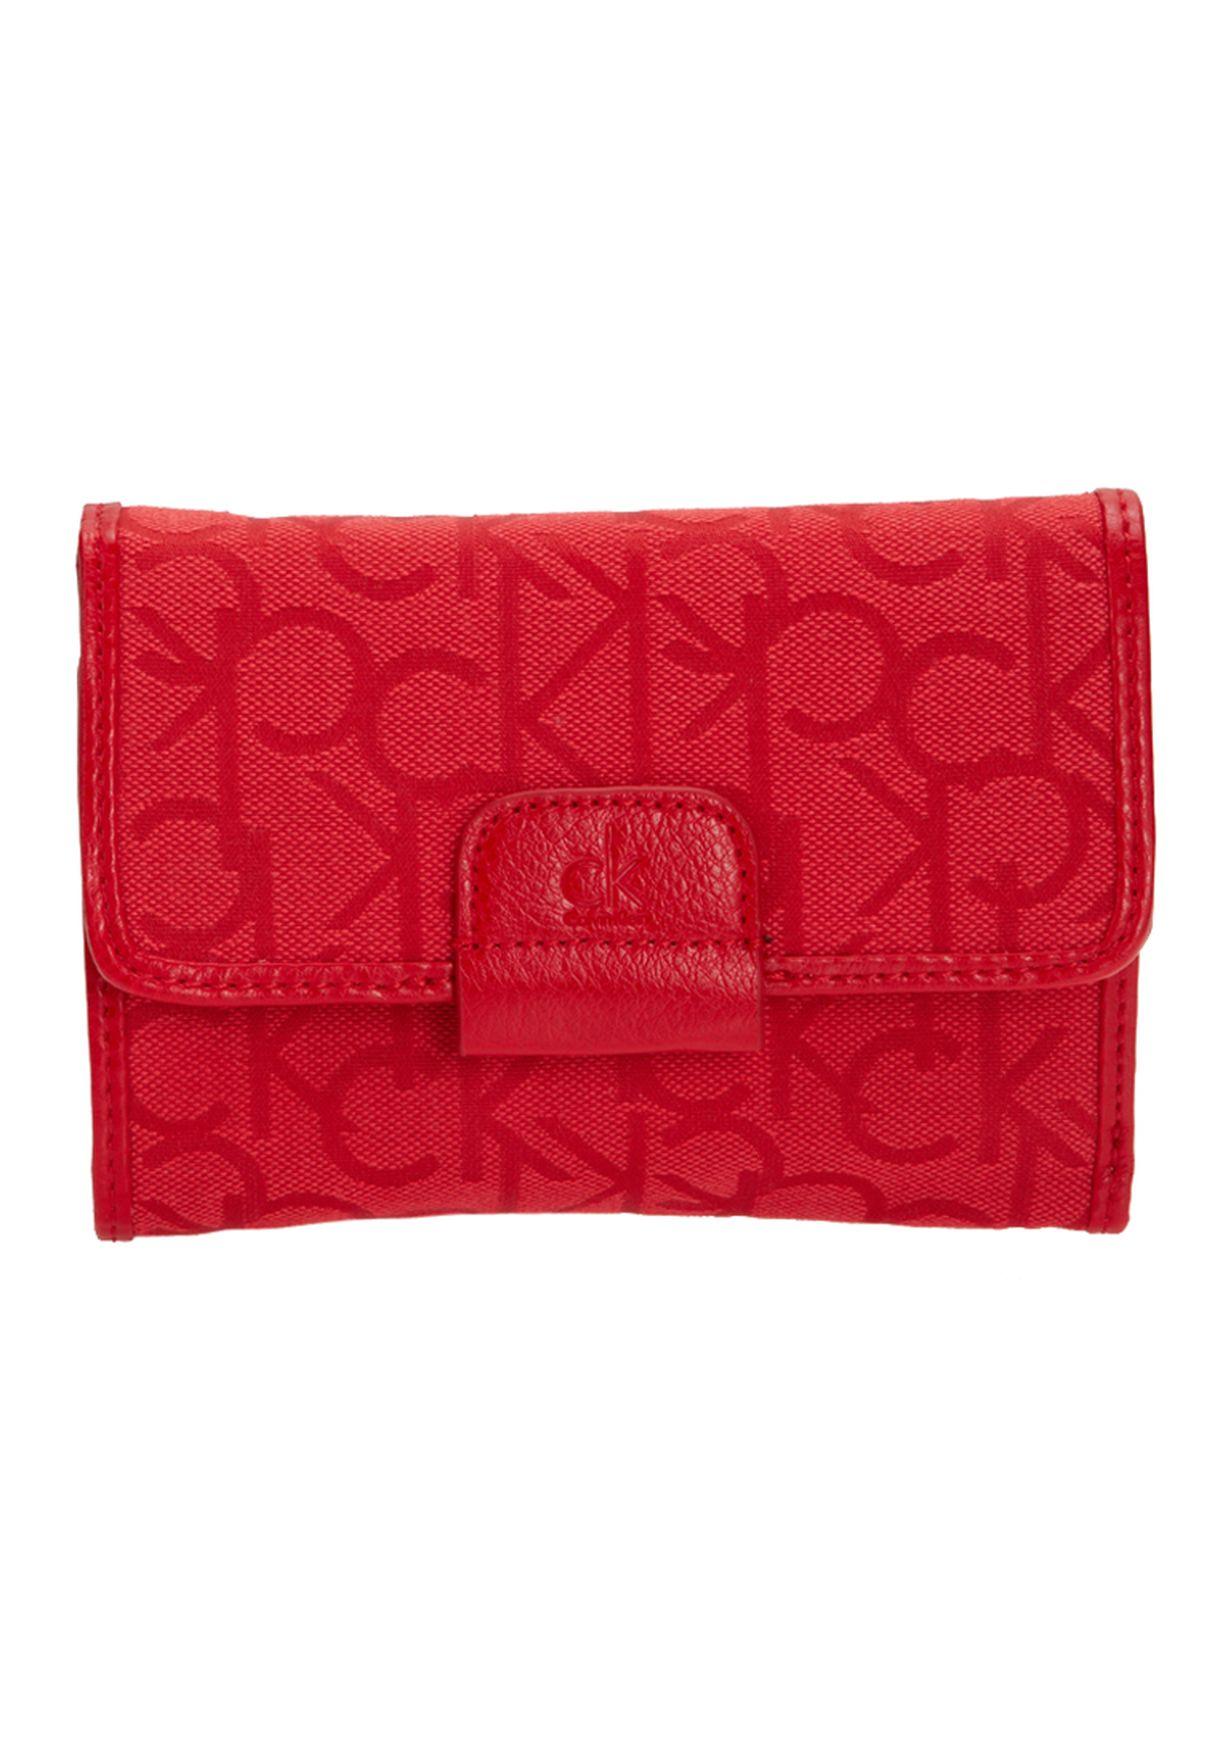 2c2ce4b34 تسوق Purse ماركة كالفن كلاين جينز لون أحمر في قطر - CA294AC98KSV